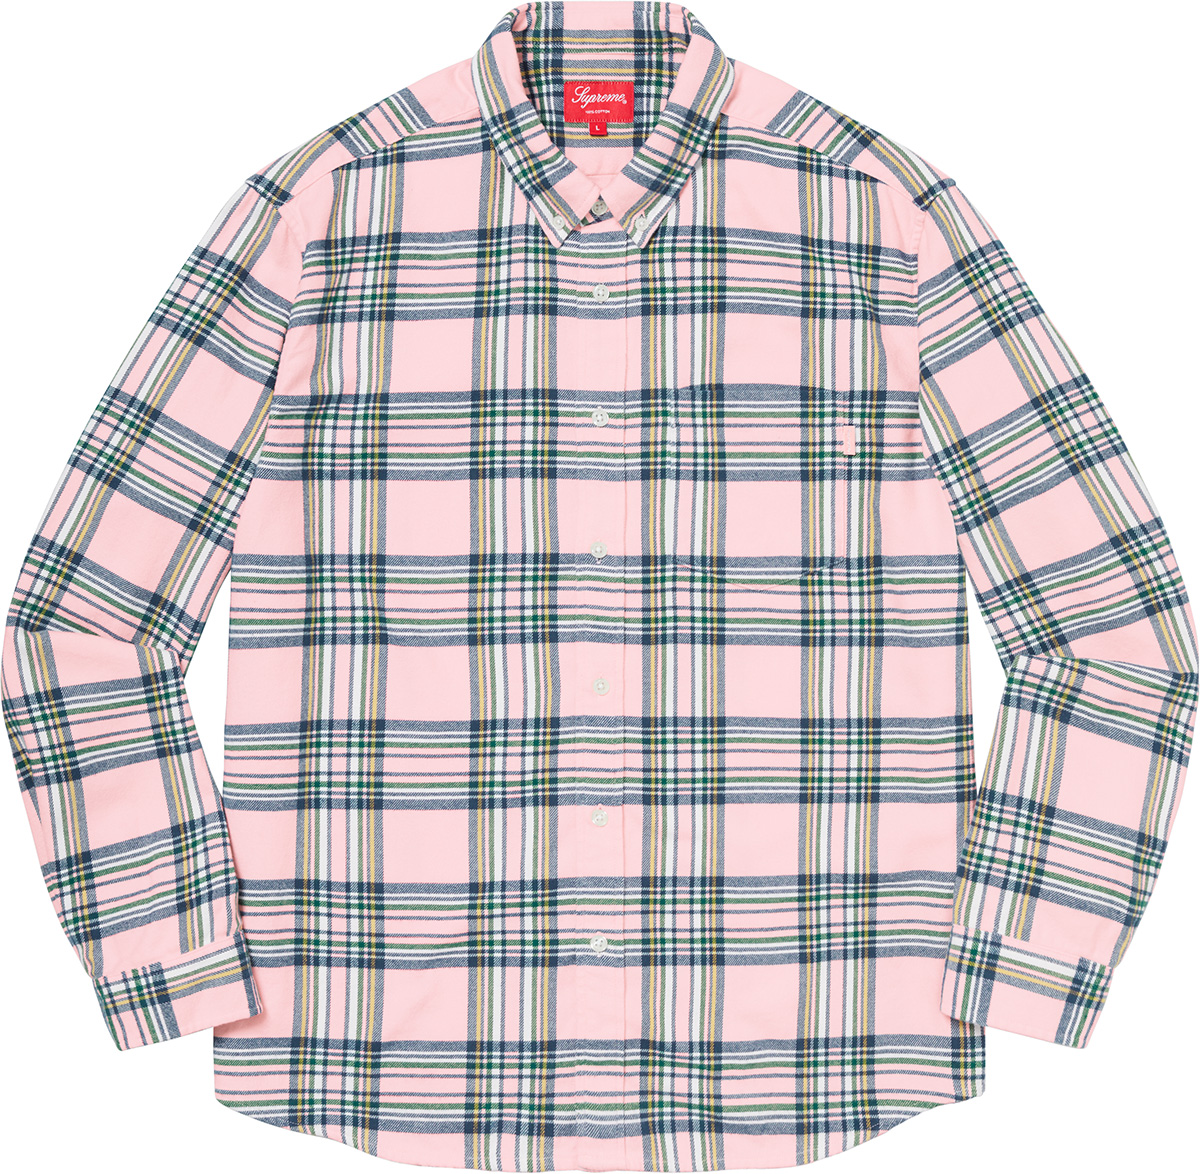 Supreme 2020fw Tartan Flannel Shirt シュプリーム ピンク